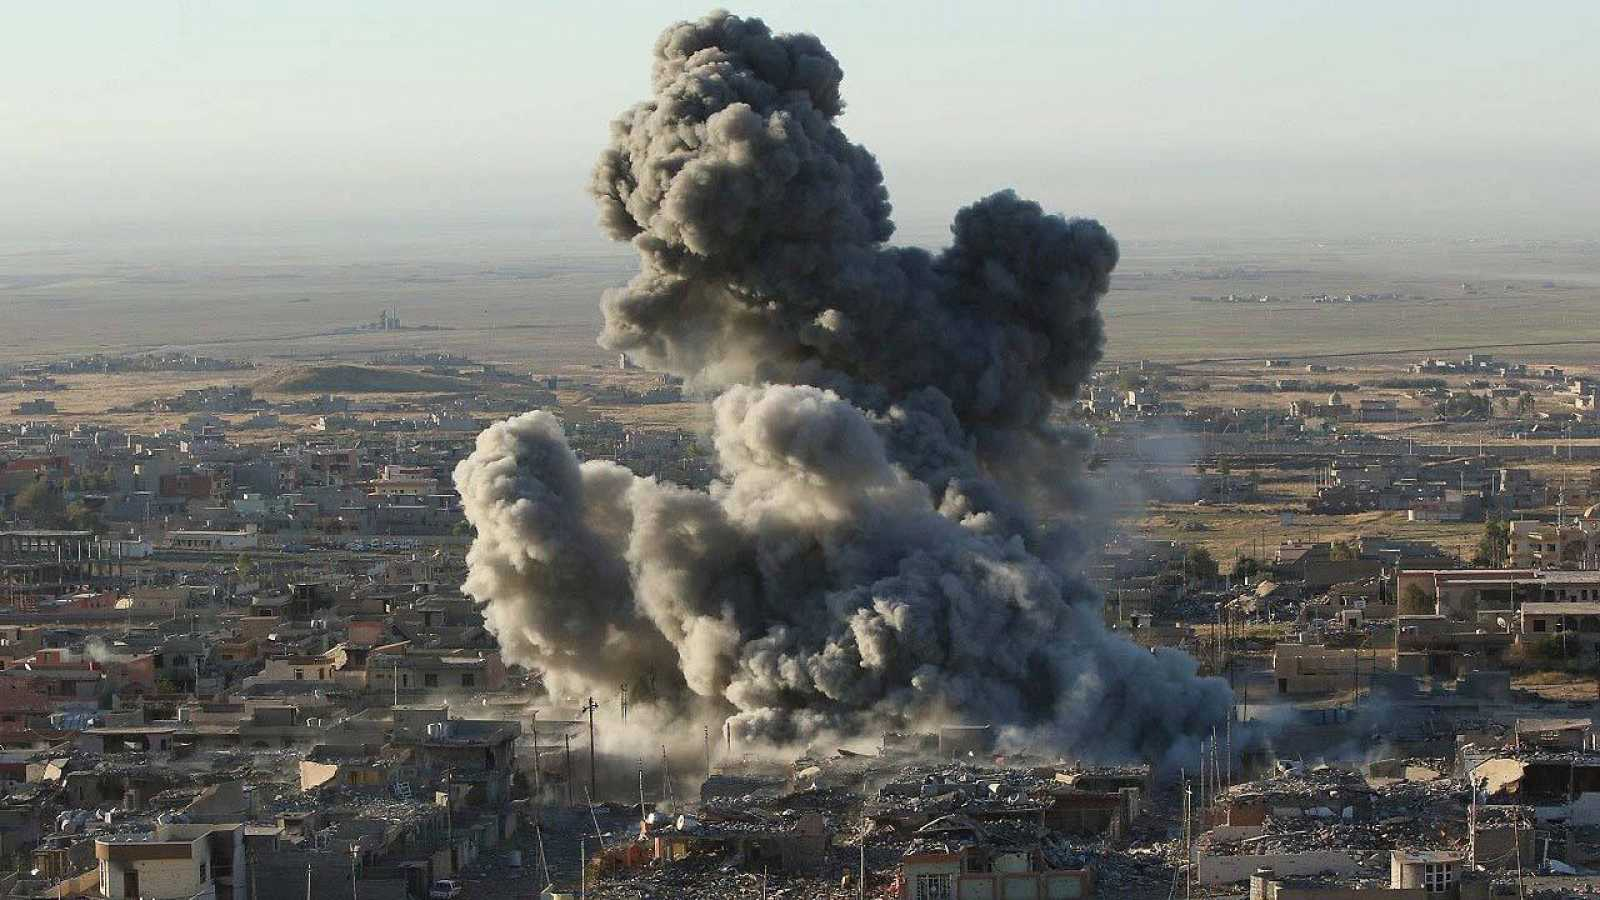 Bombardeo de EE.UU. sobre Sinyar, en el norte de Irak, el 12 de noviembre de 2015. REUTERS/Ari Jalal